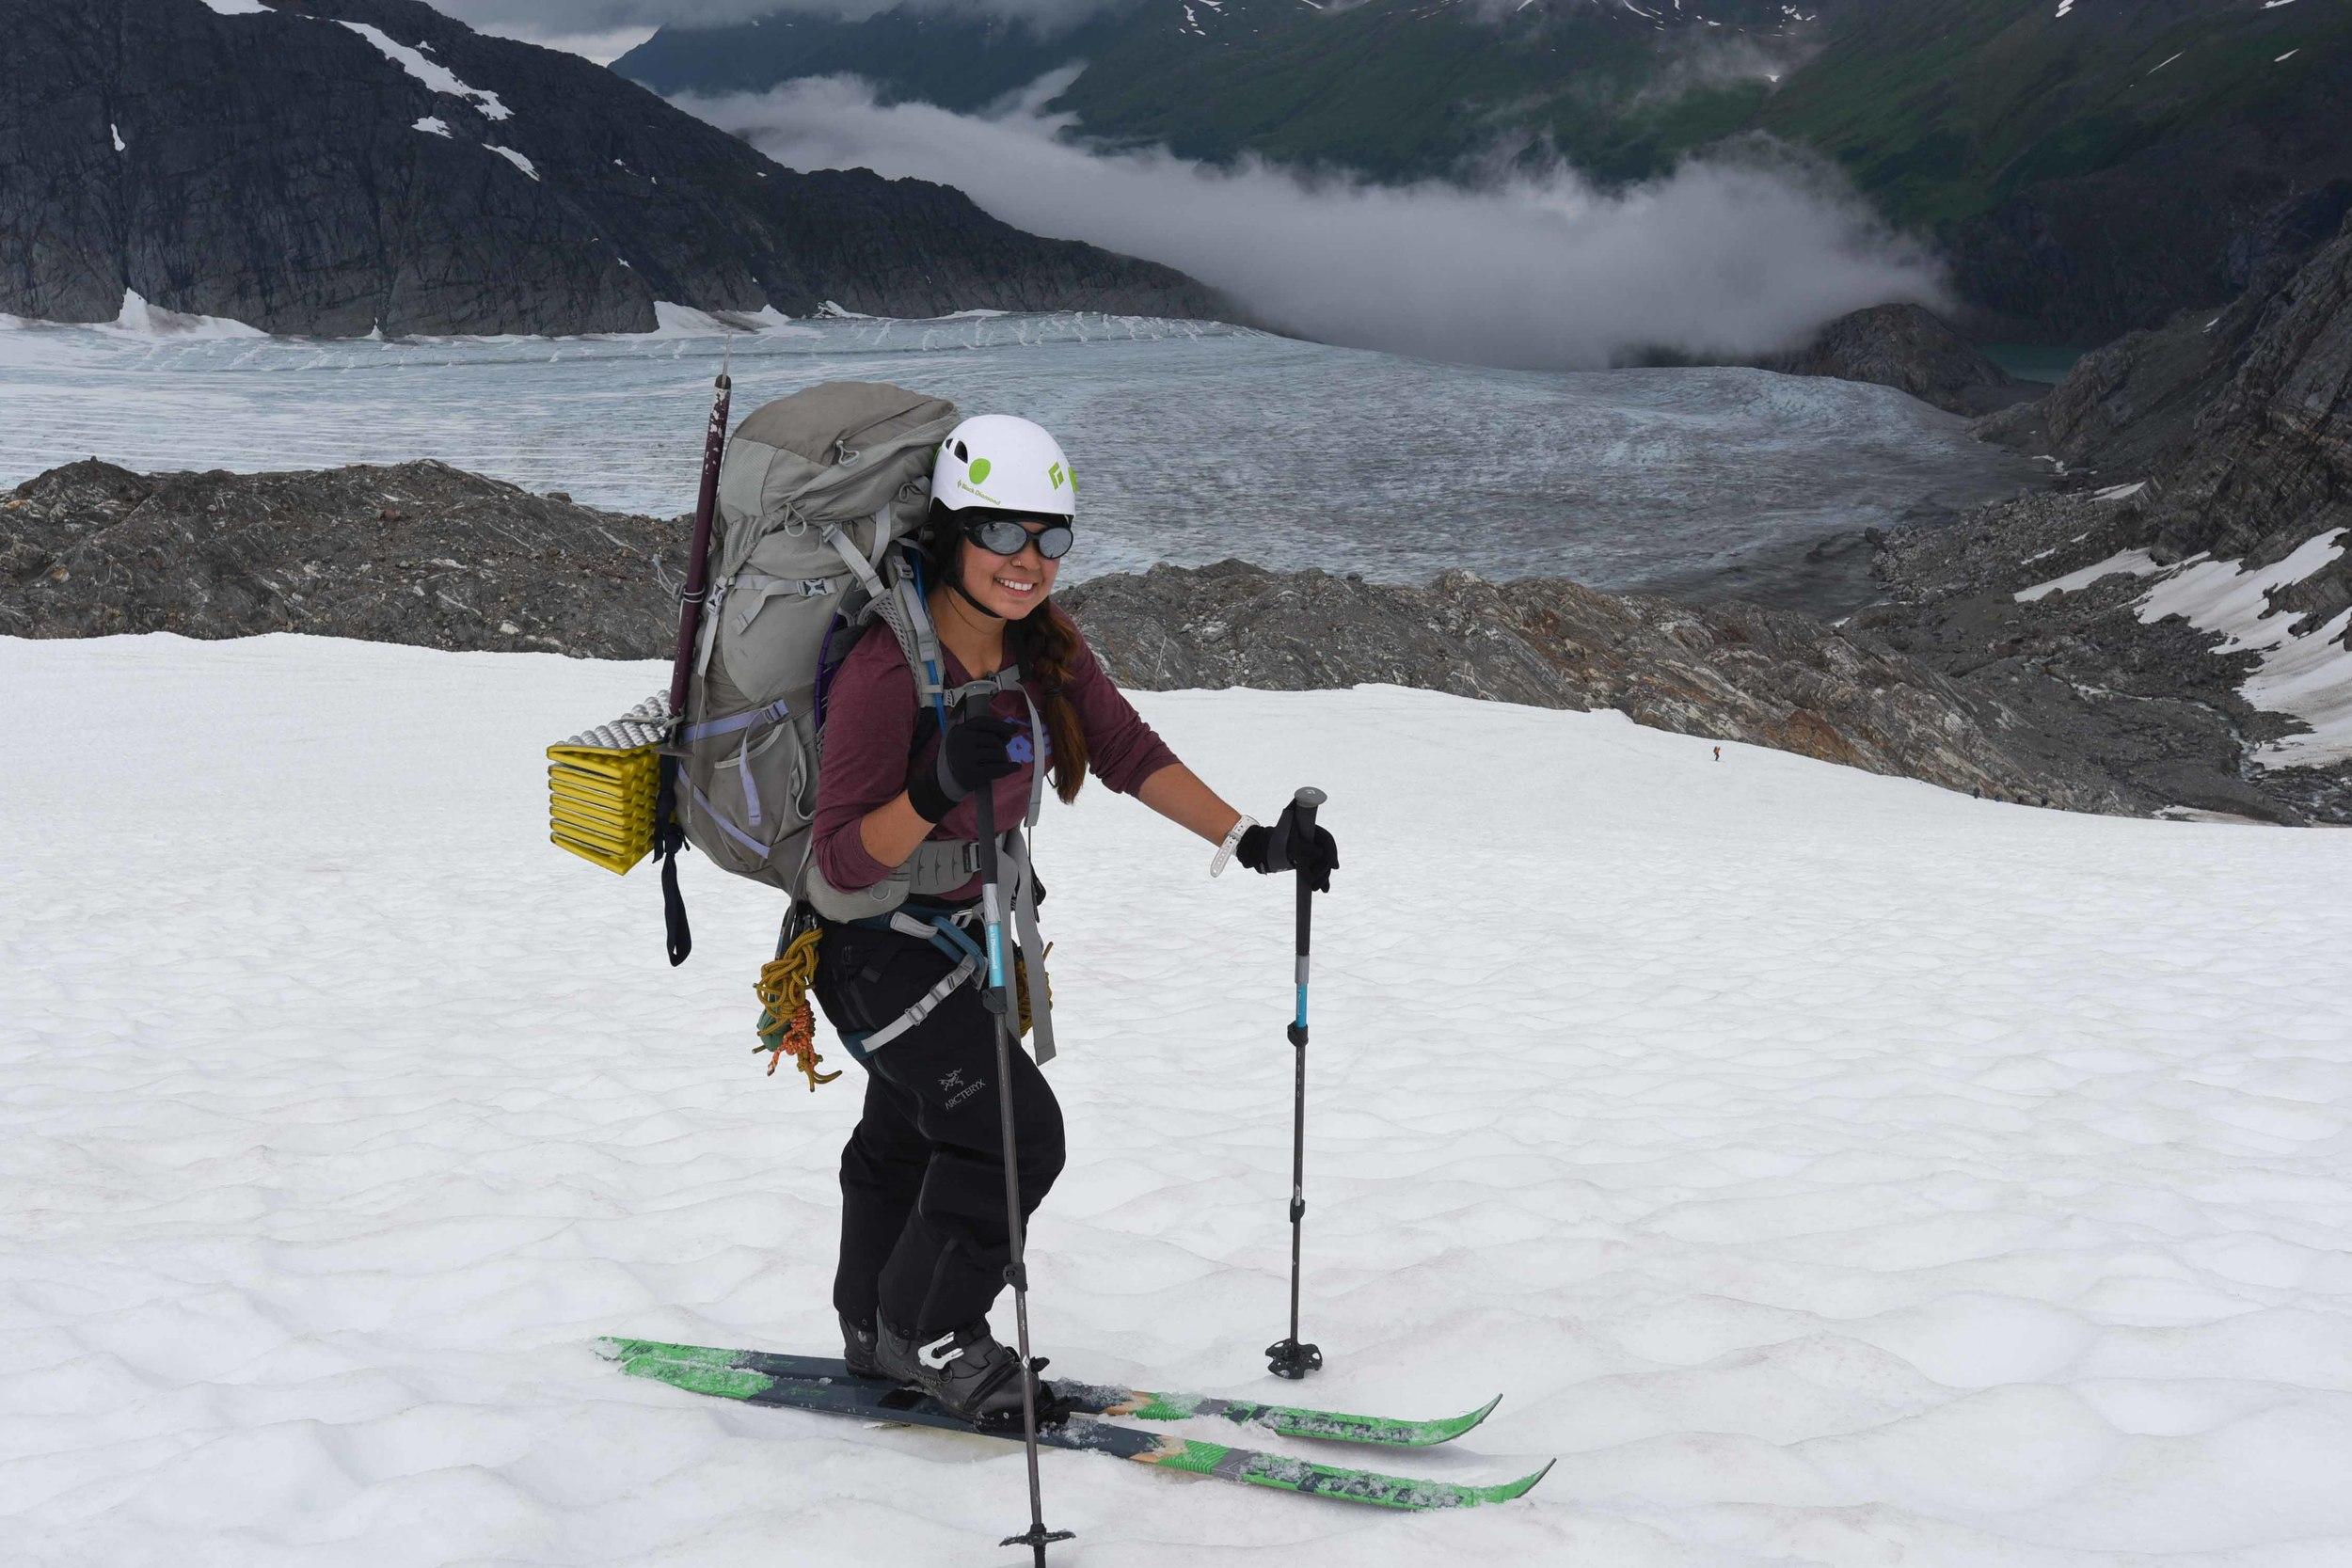 Author Shawnee Reynoso heading out on the Camp 17 to Camp 10 traverse. Photo courtesy of PBJ Photography.